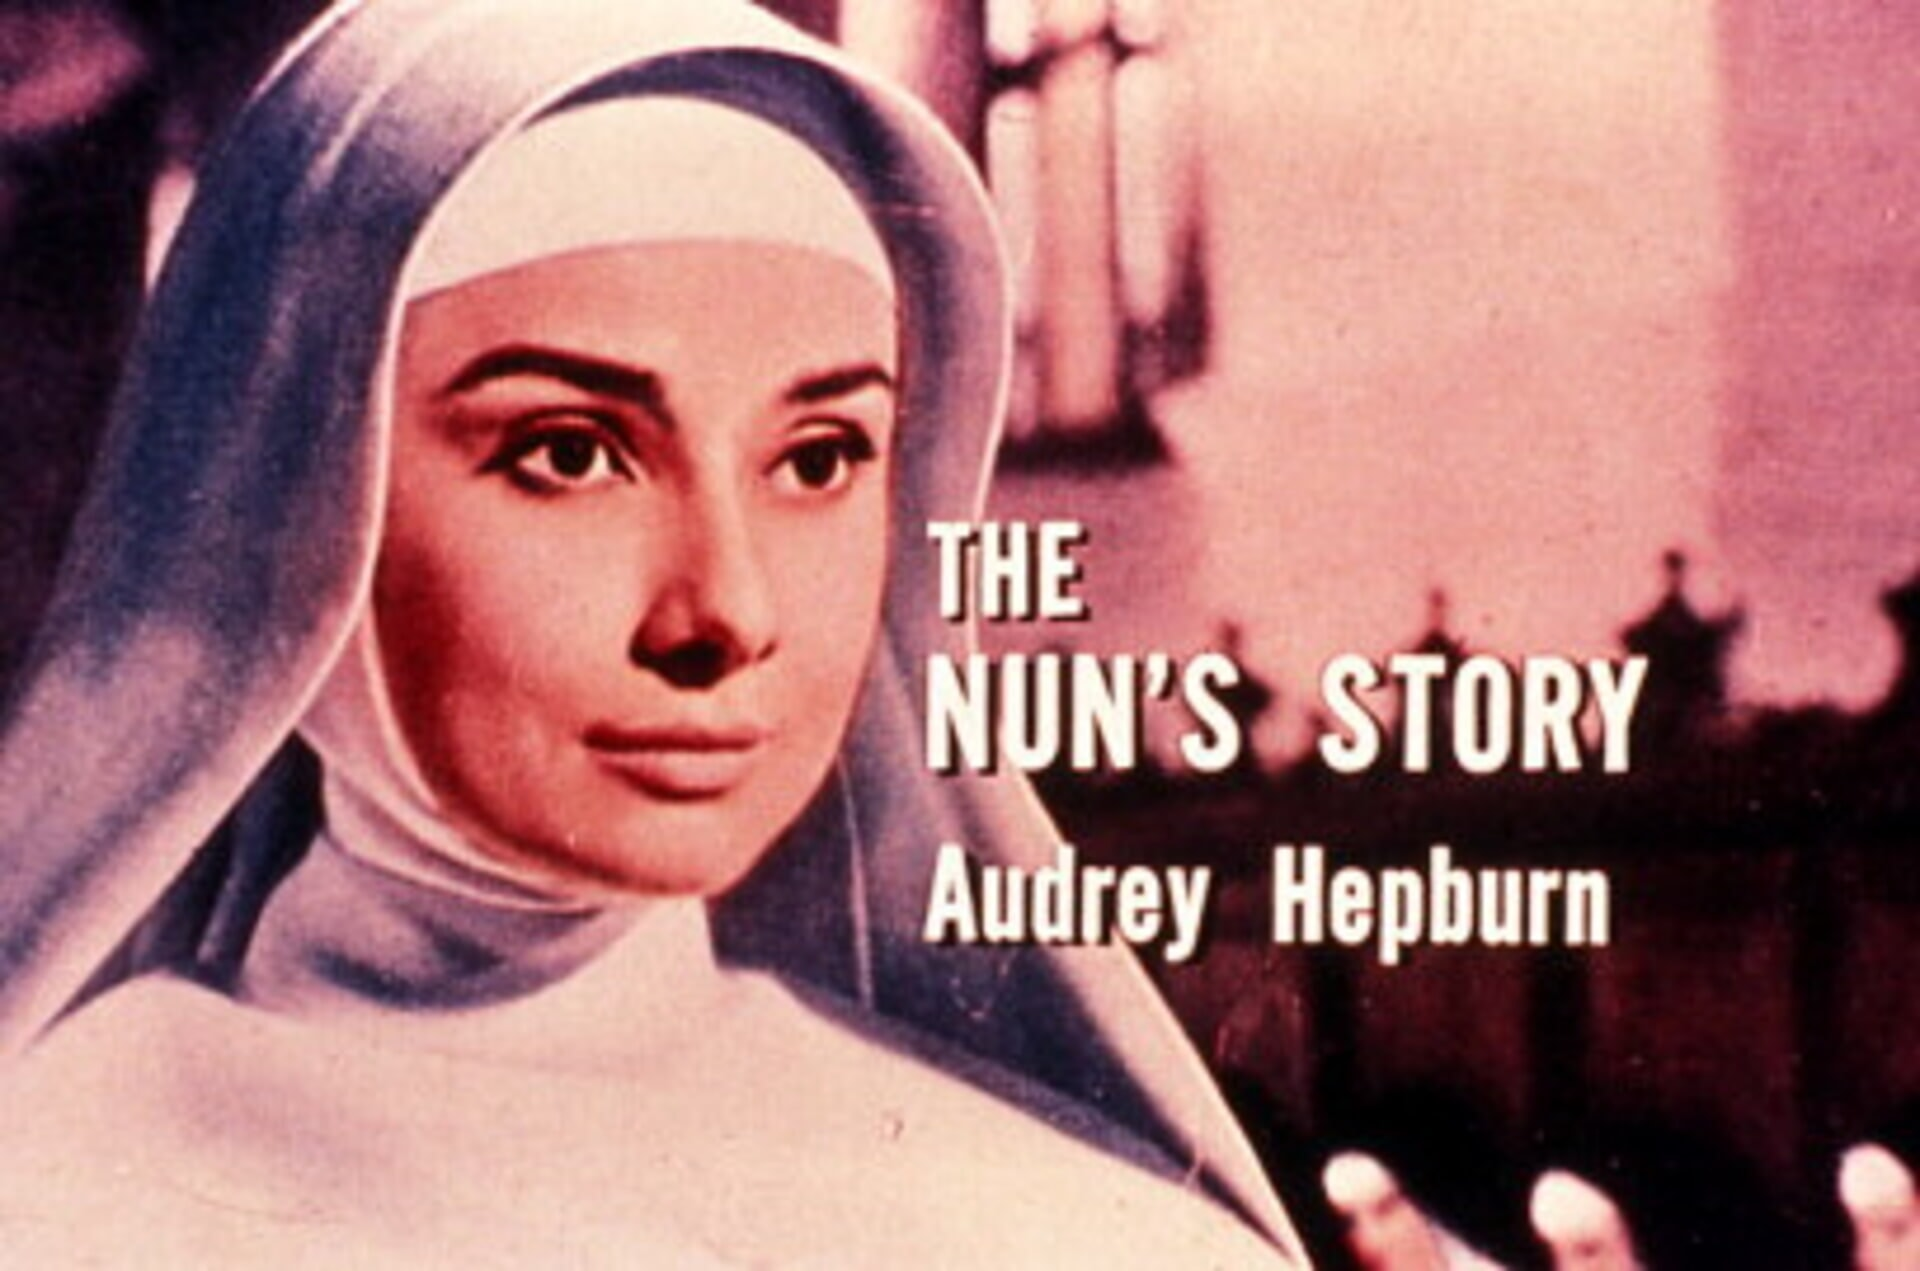 The Nun's Story - Image 2